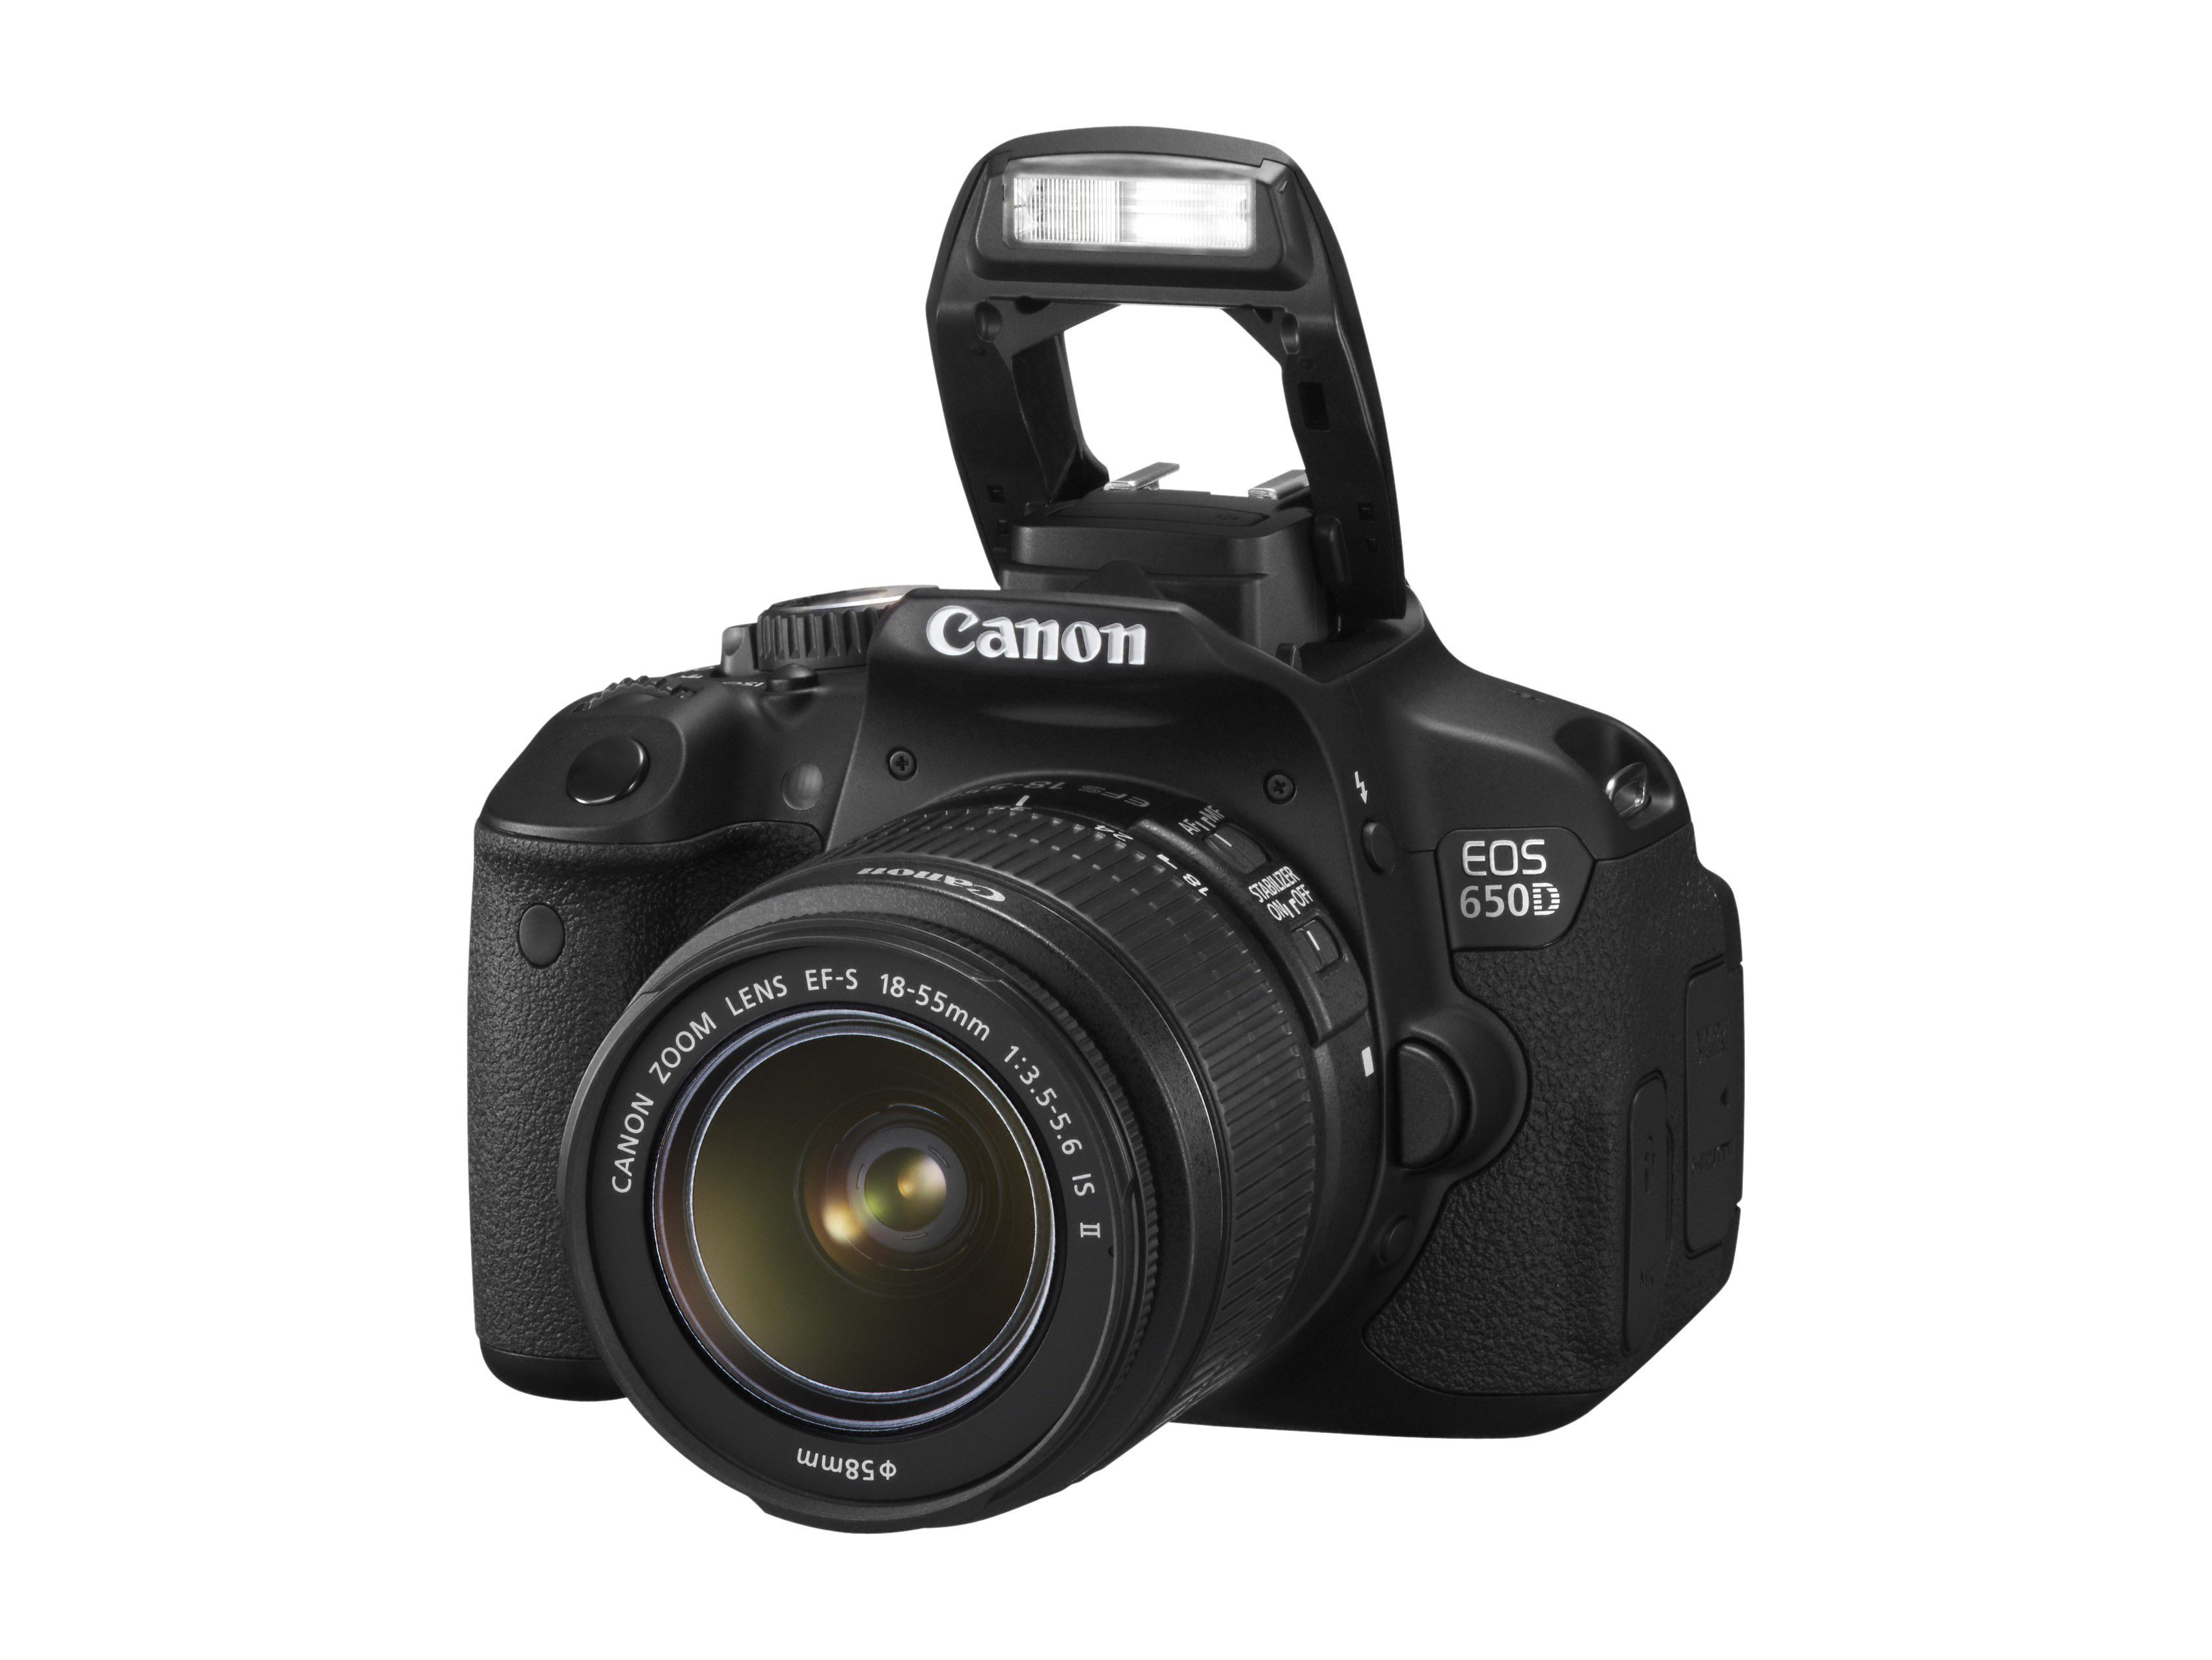 Kamera auslösungen ermitteln macwelt